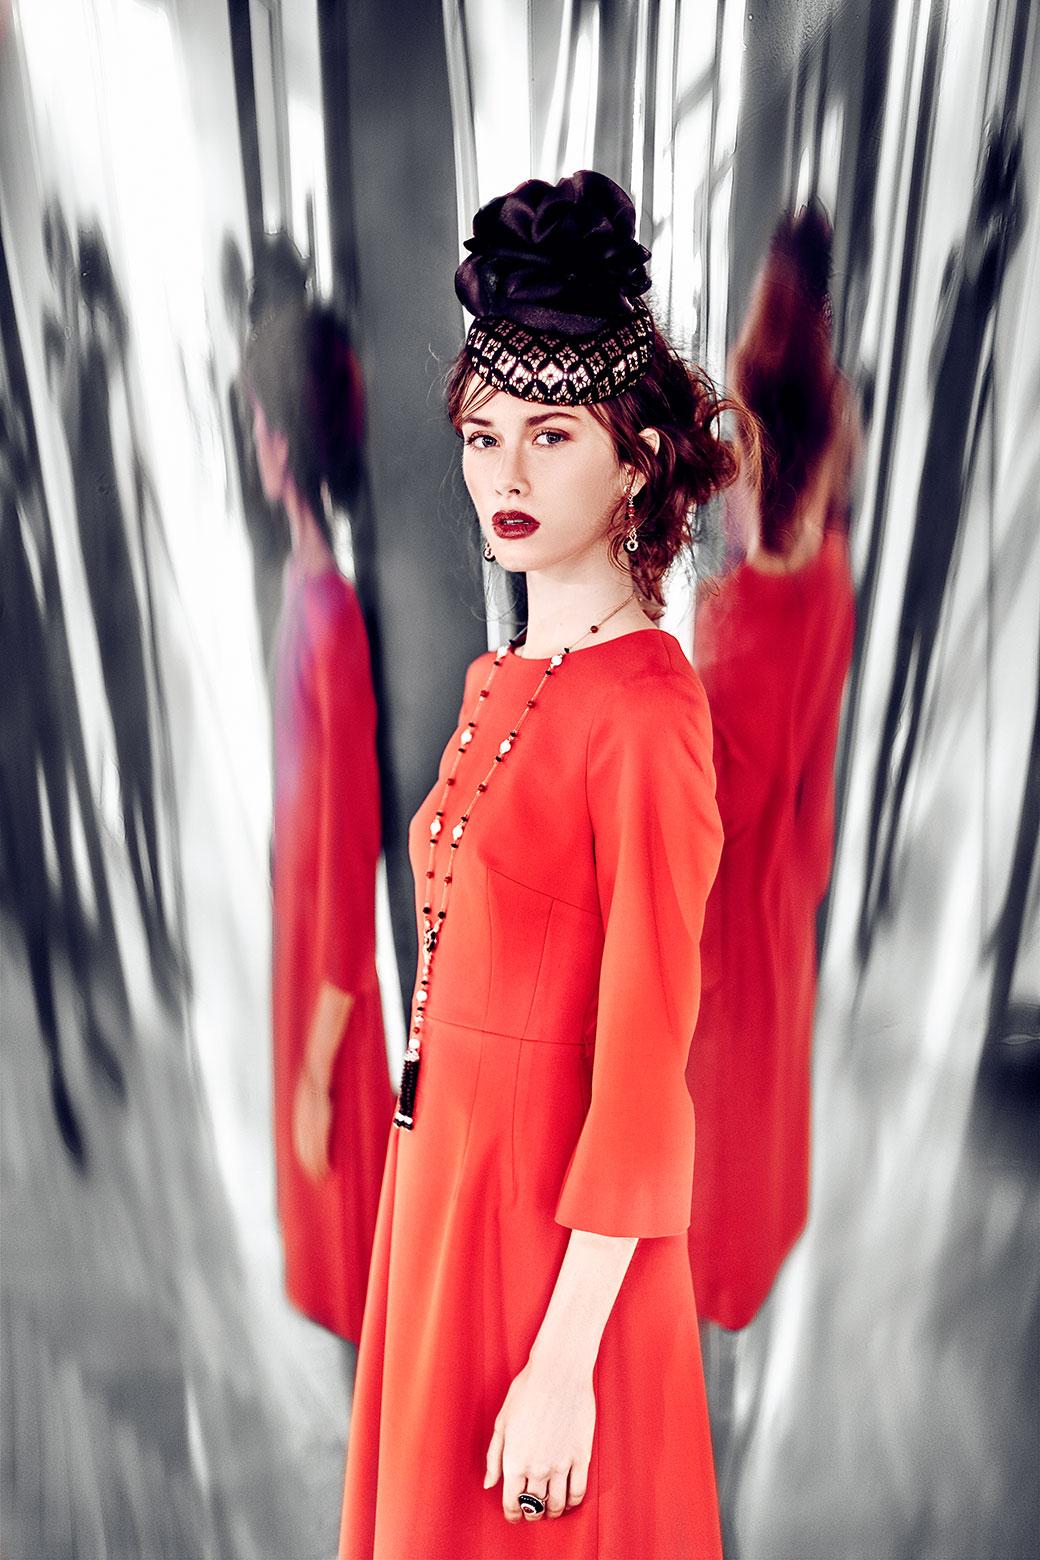 Červené pouzdrové šaty<br>foto - Ondřej Košík, makeup and hair - Natálie Hostačná, šperky - Style Avenue<br>hotel Boscolo Prague